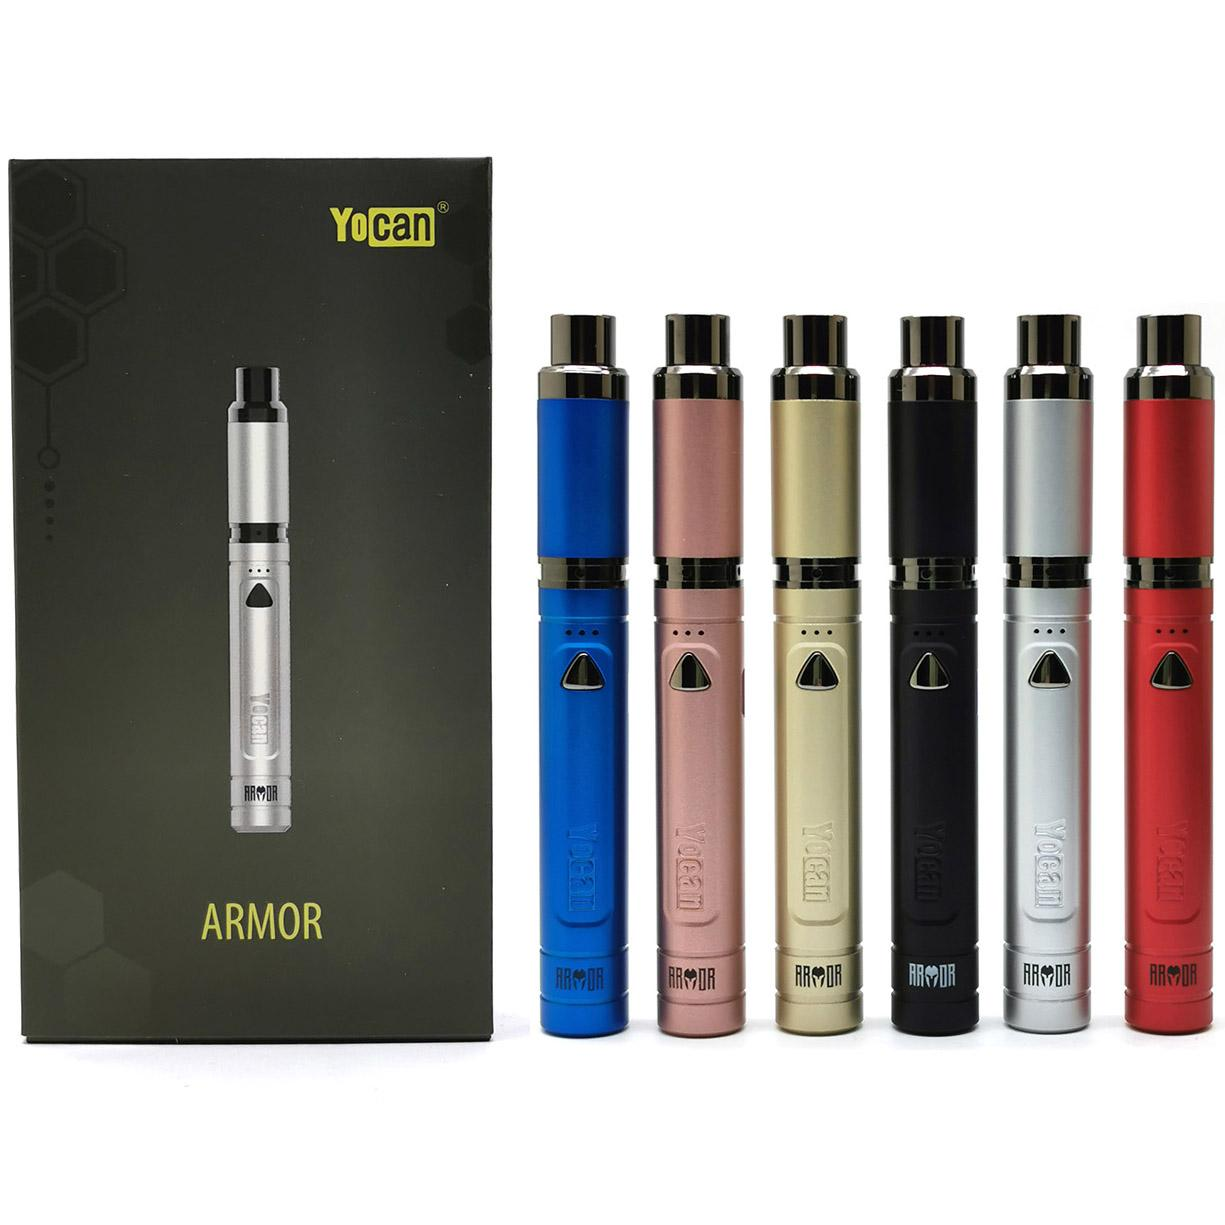 Yocan Armor Kit Wax Concentrate Vaporizer Electronic Cigarette Kit 380mAh Vape Battery With Quartz Dual Coil QDC 100% Original